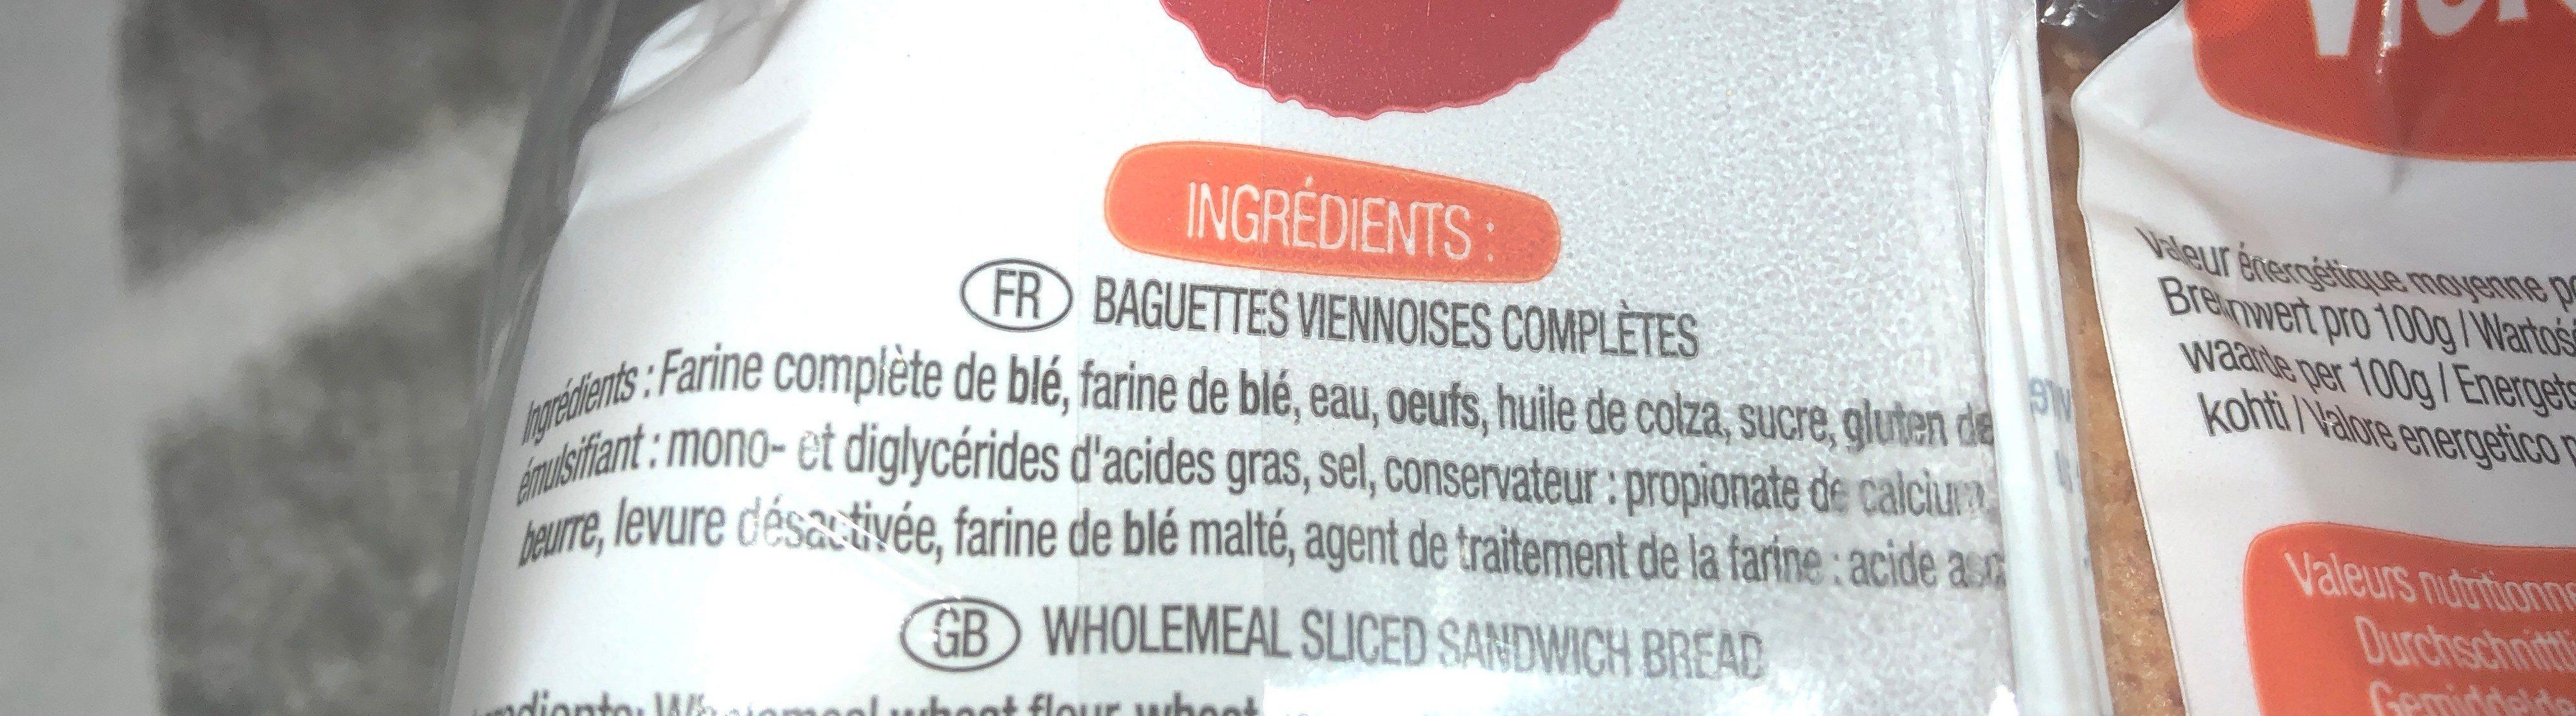 4 Baguettes viennoises - Ingrediënten - fr